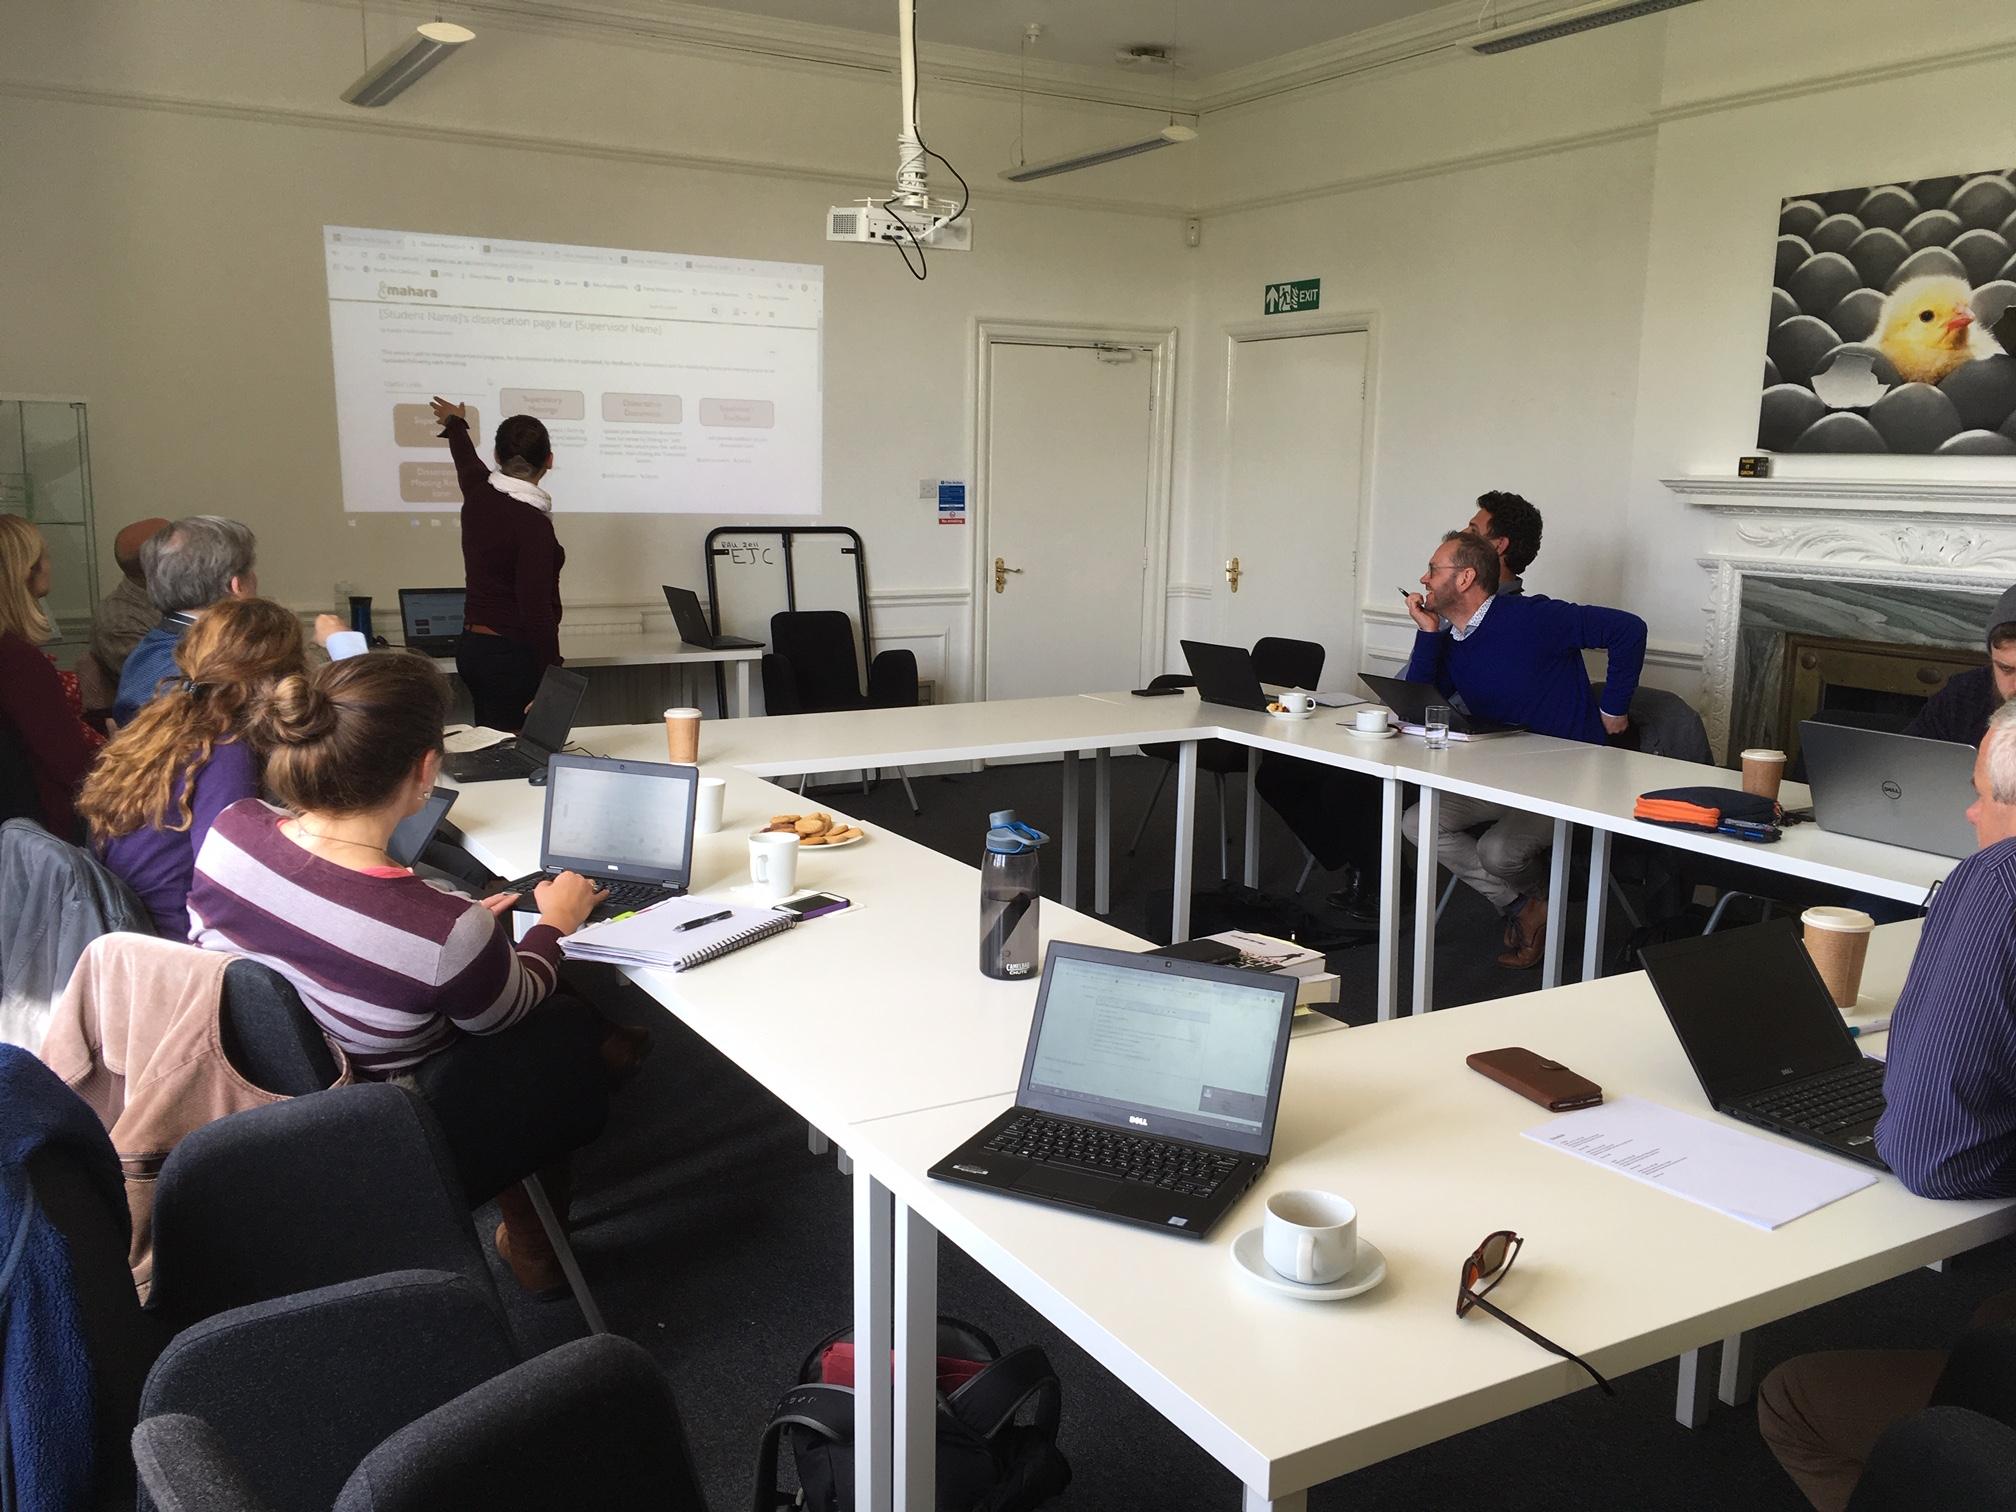 Learning Technologist Aurelie Soulier outlines the dissertation supervision plans for Catalyst